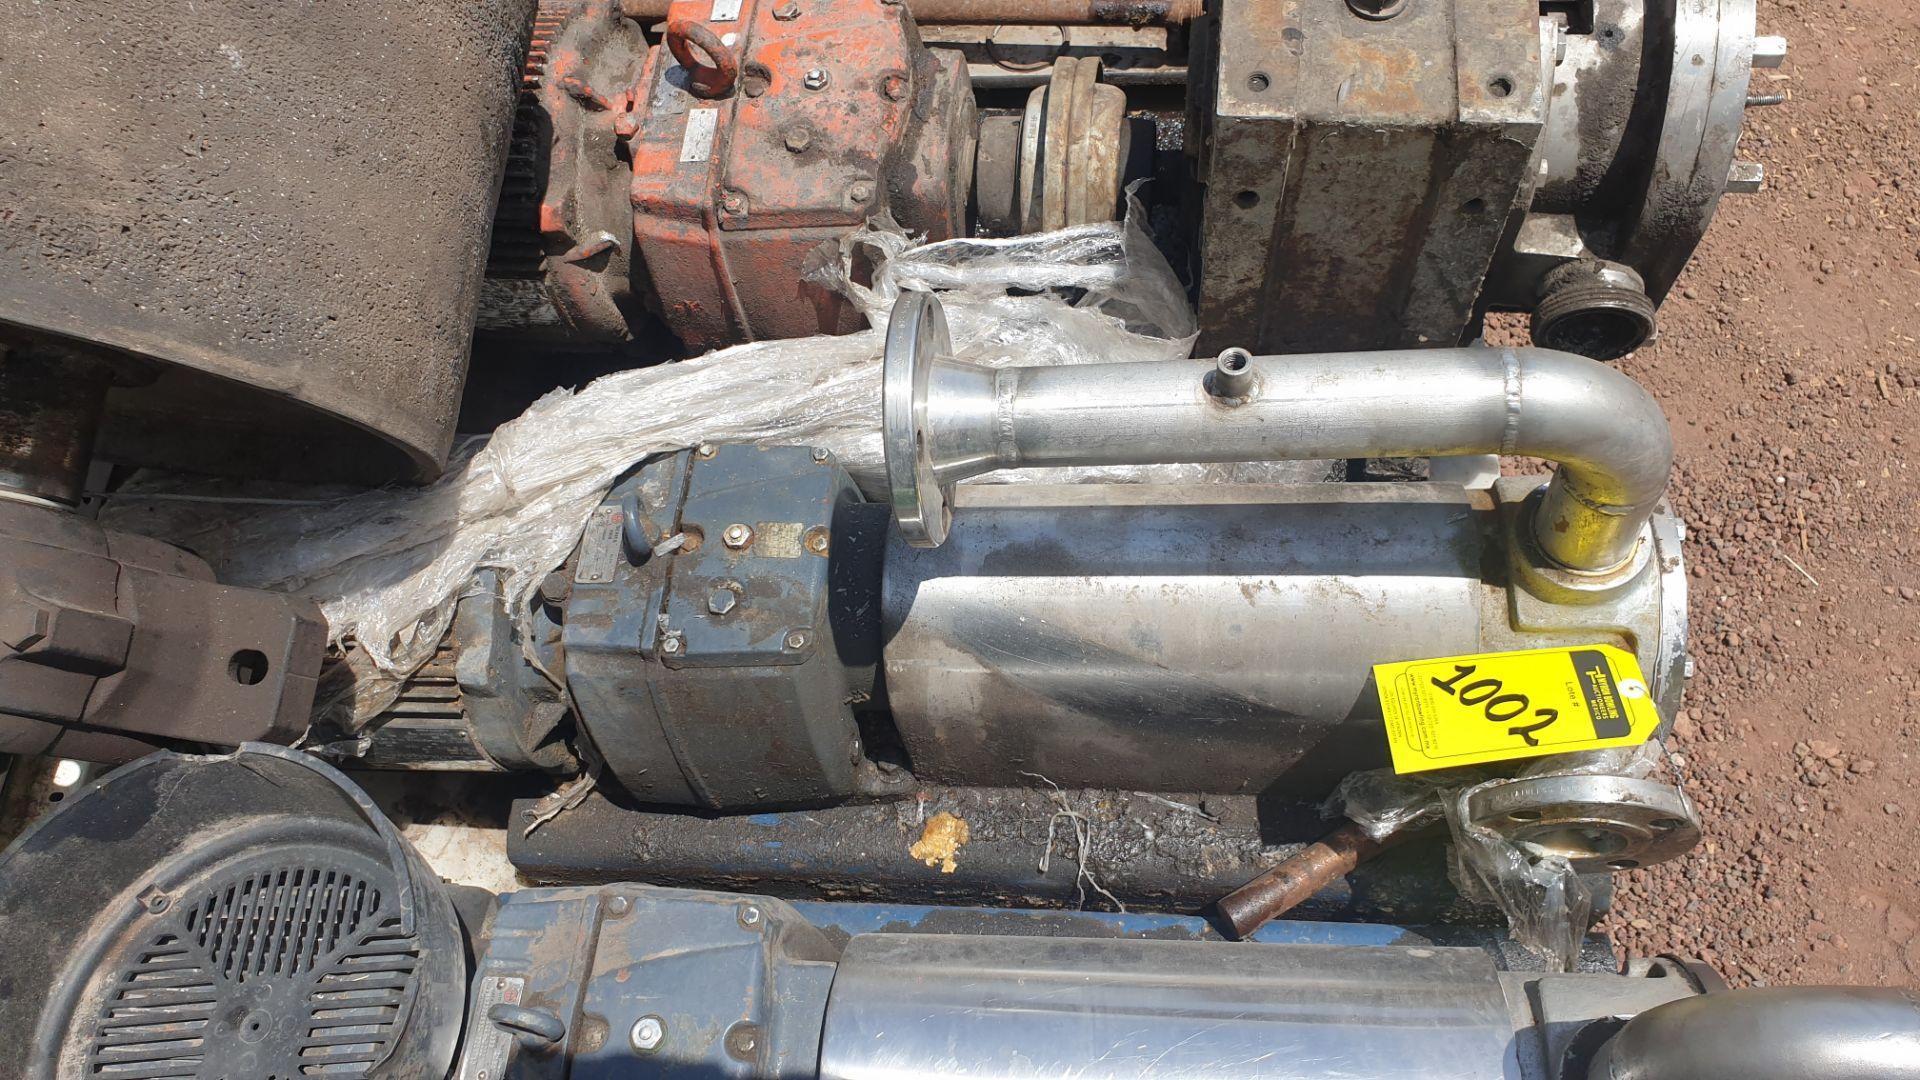 Pneumatic pump, includes emerson motor, model 684982 capacity 10Hp 230v - 460v - Image 3 of 8